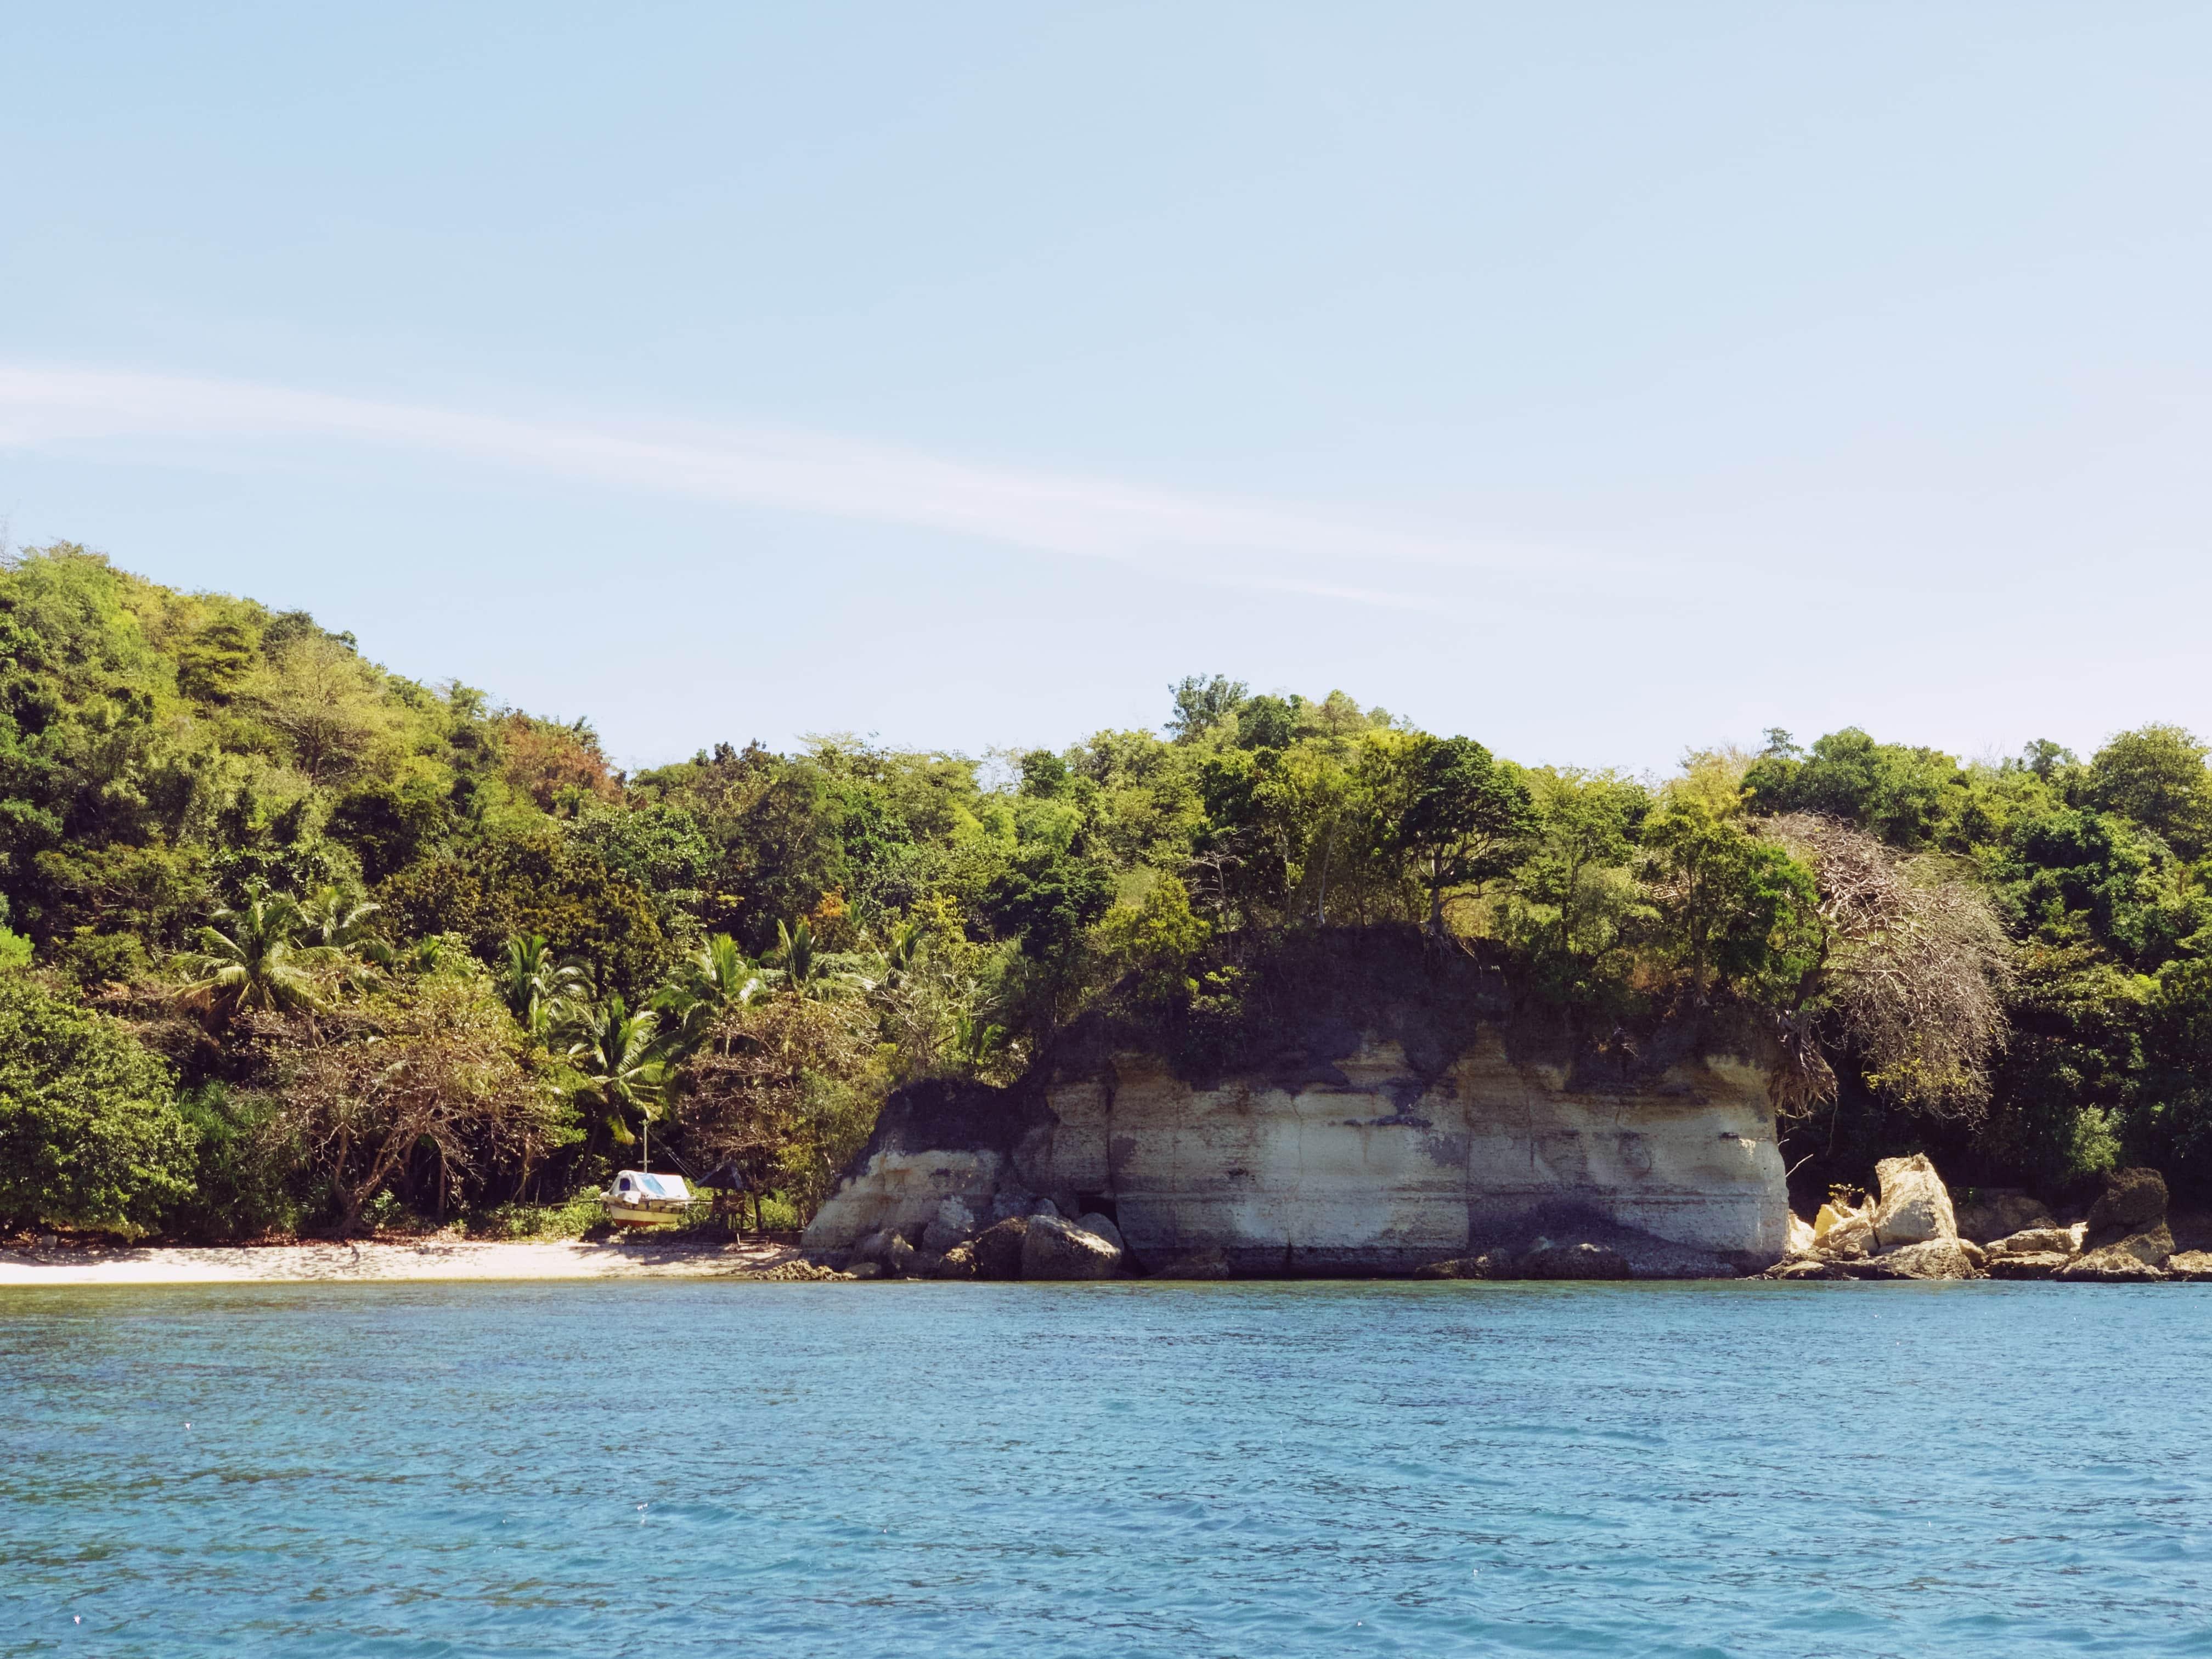 Guimaras tourist spots, Guimaras Island travel guide, where to go in Guimaras Island, Guimaras Island, Fairy Castle